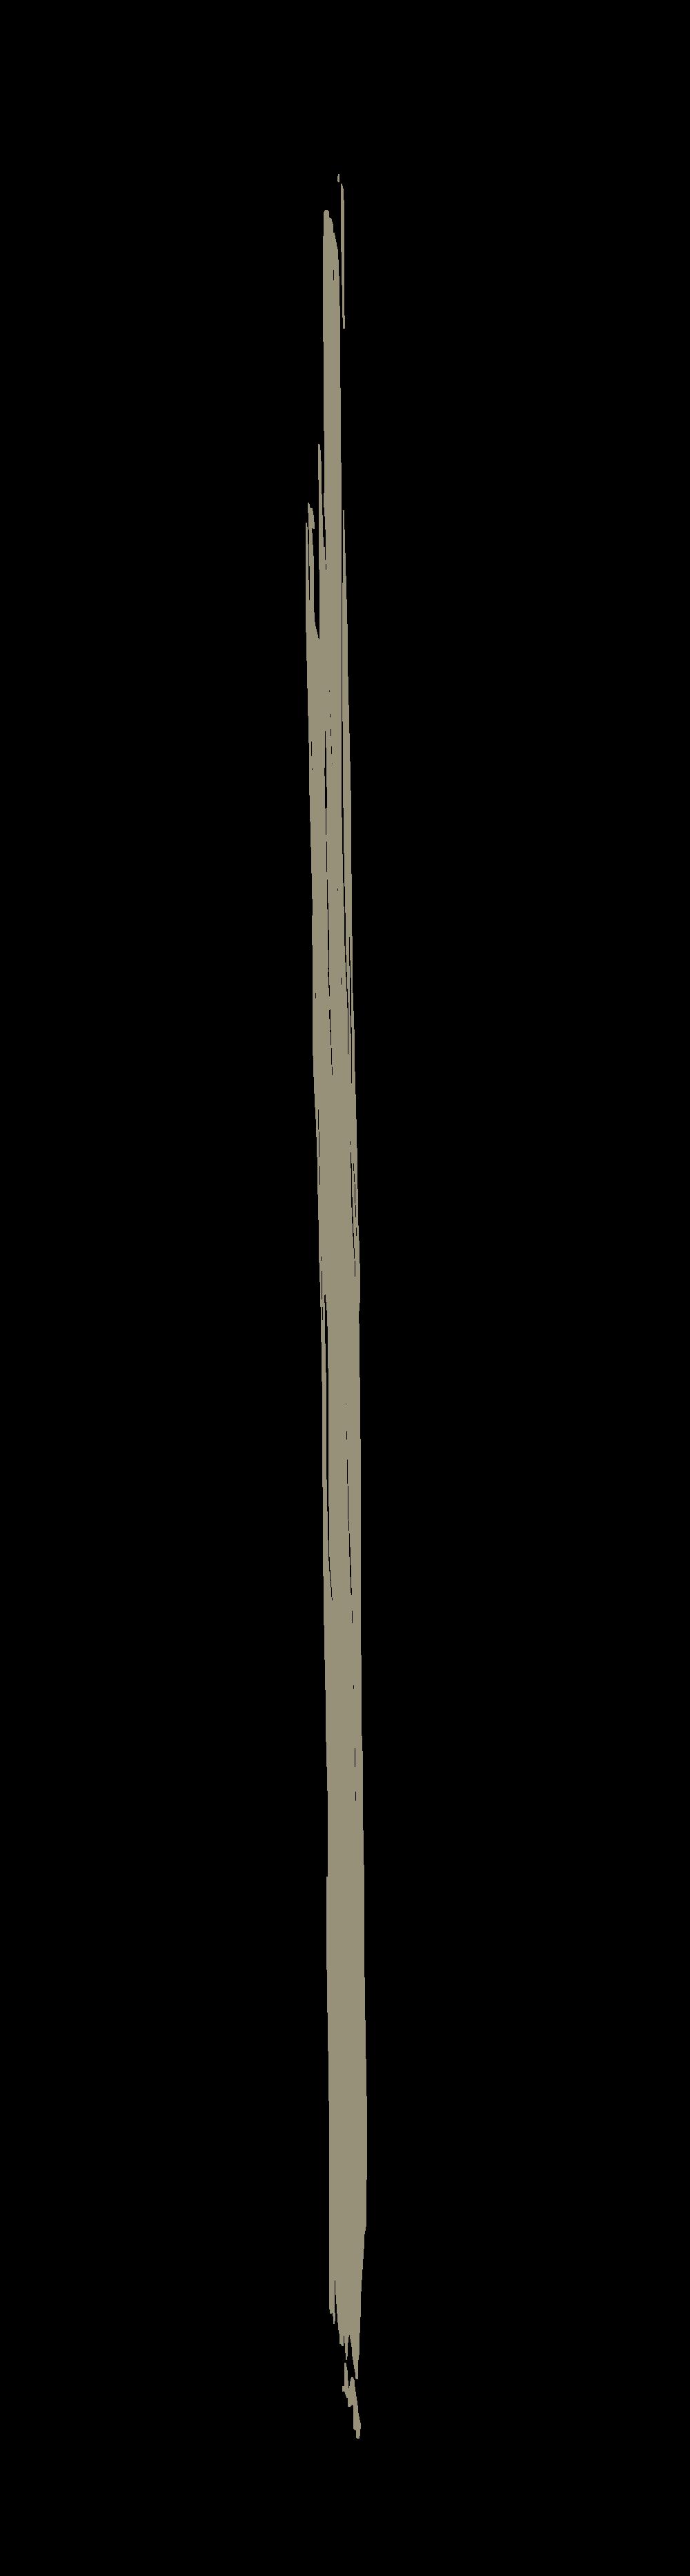 line-07.png